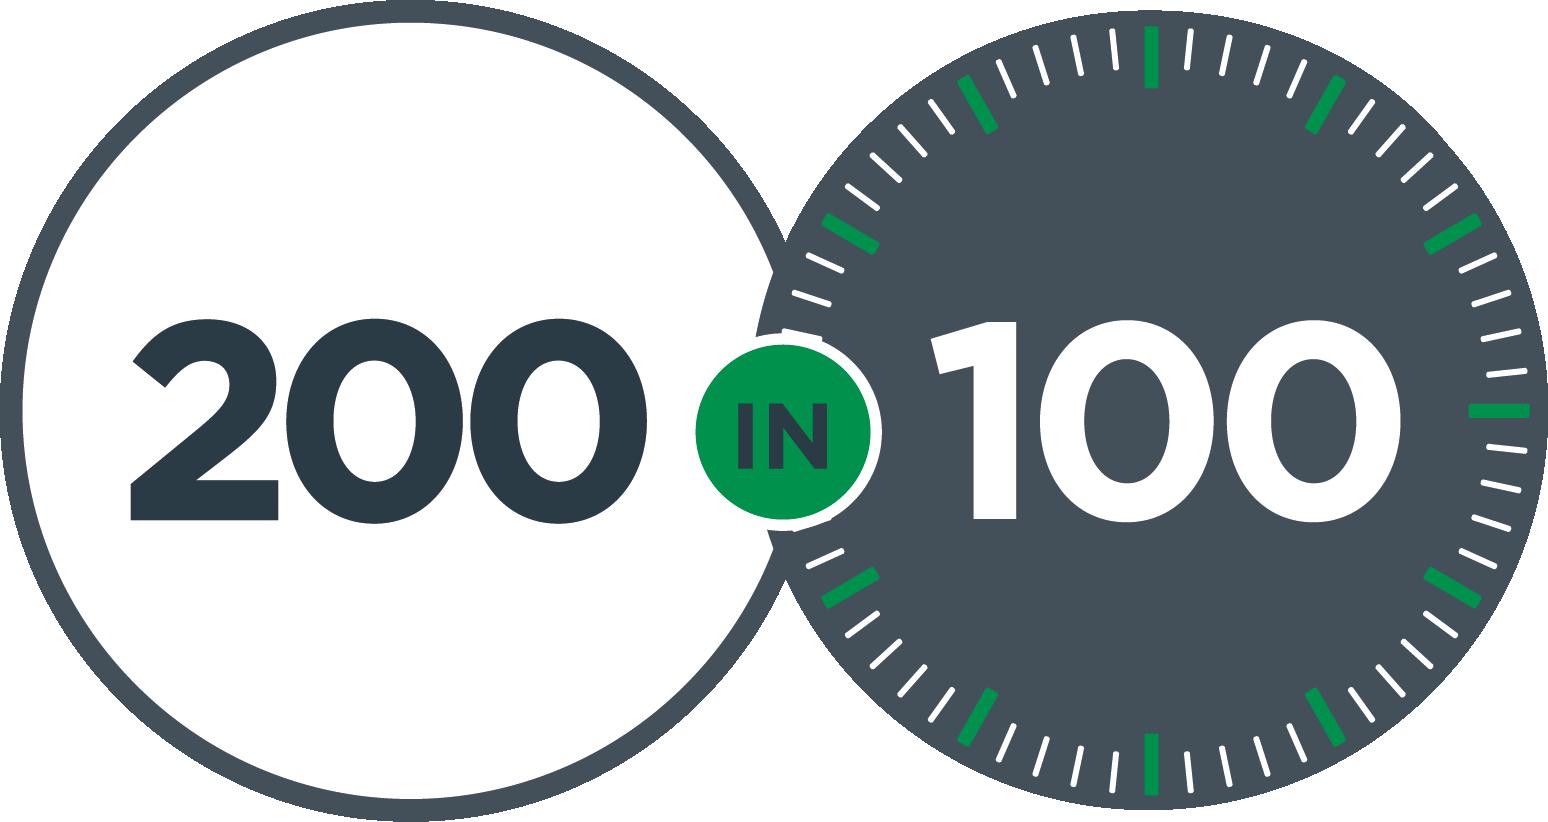 Weston College 200in100 logo